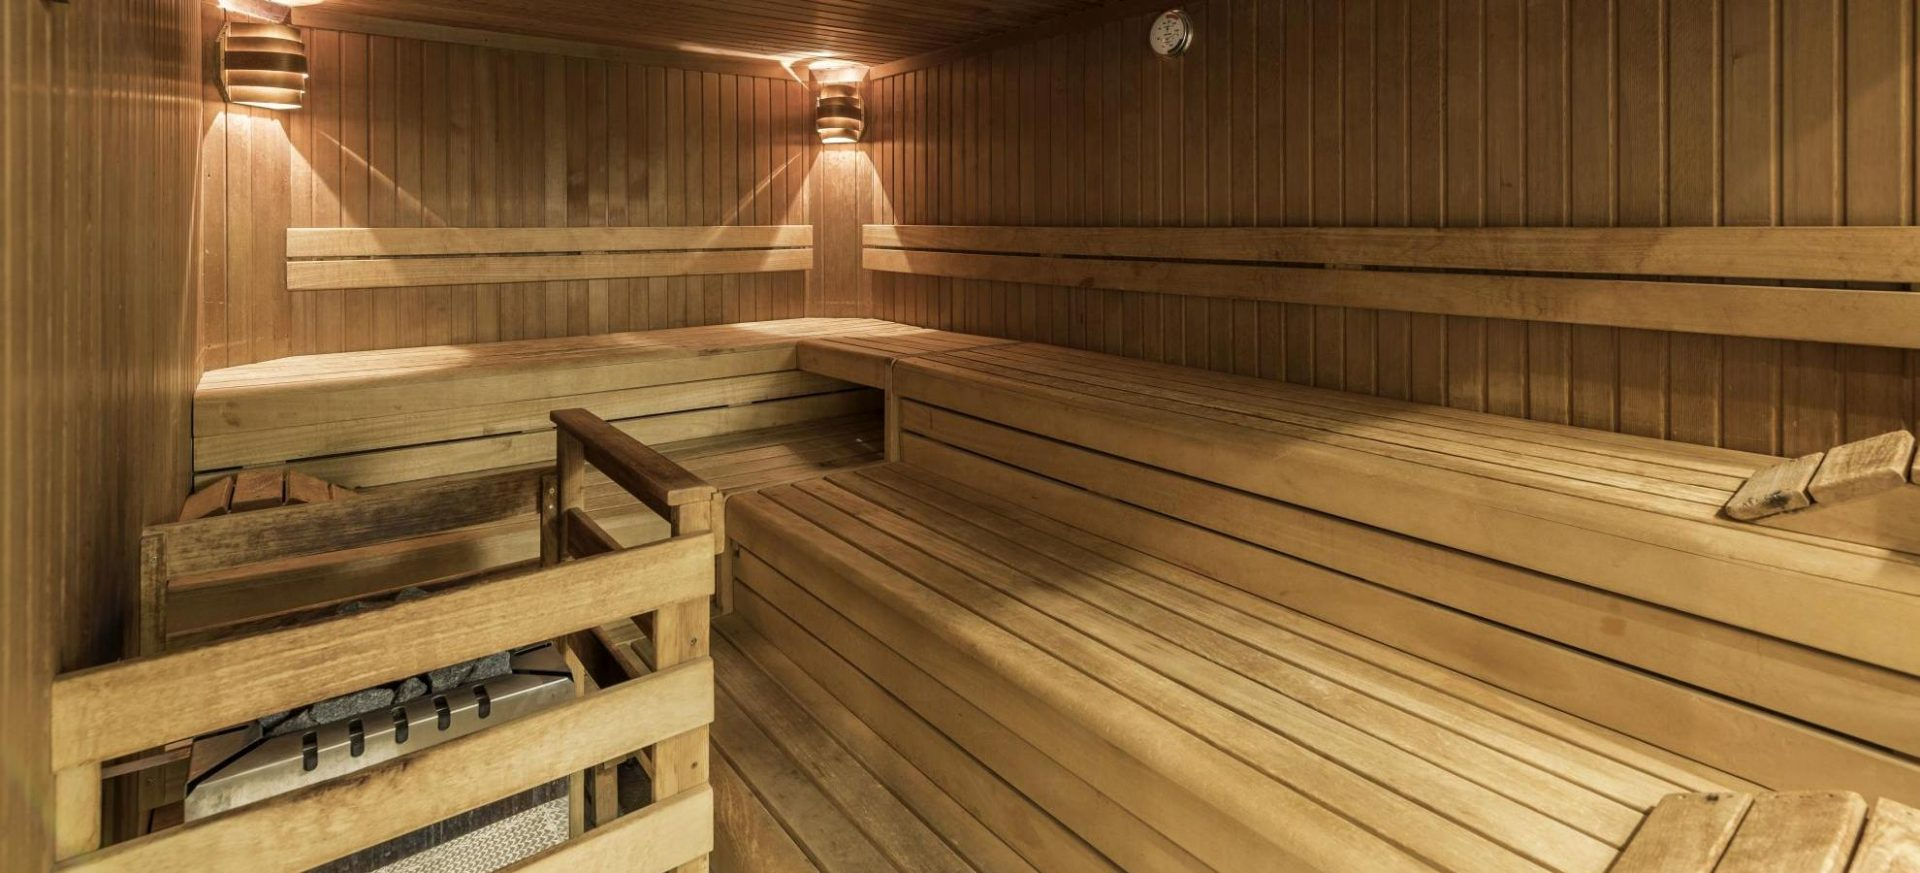 Park Inn by Radisson Berlin Alexanderplatz Sauna